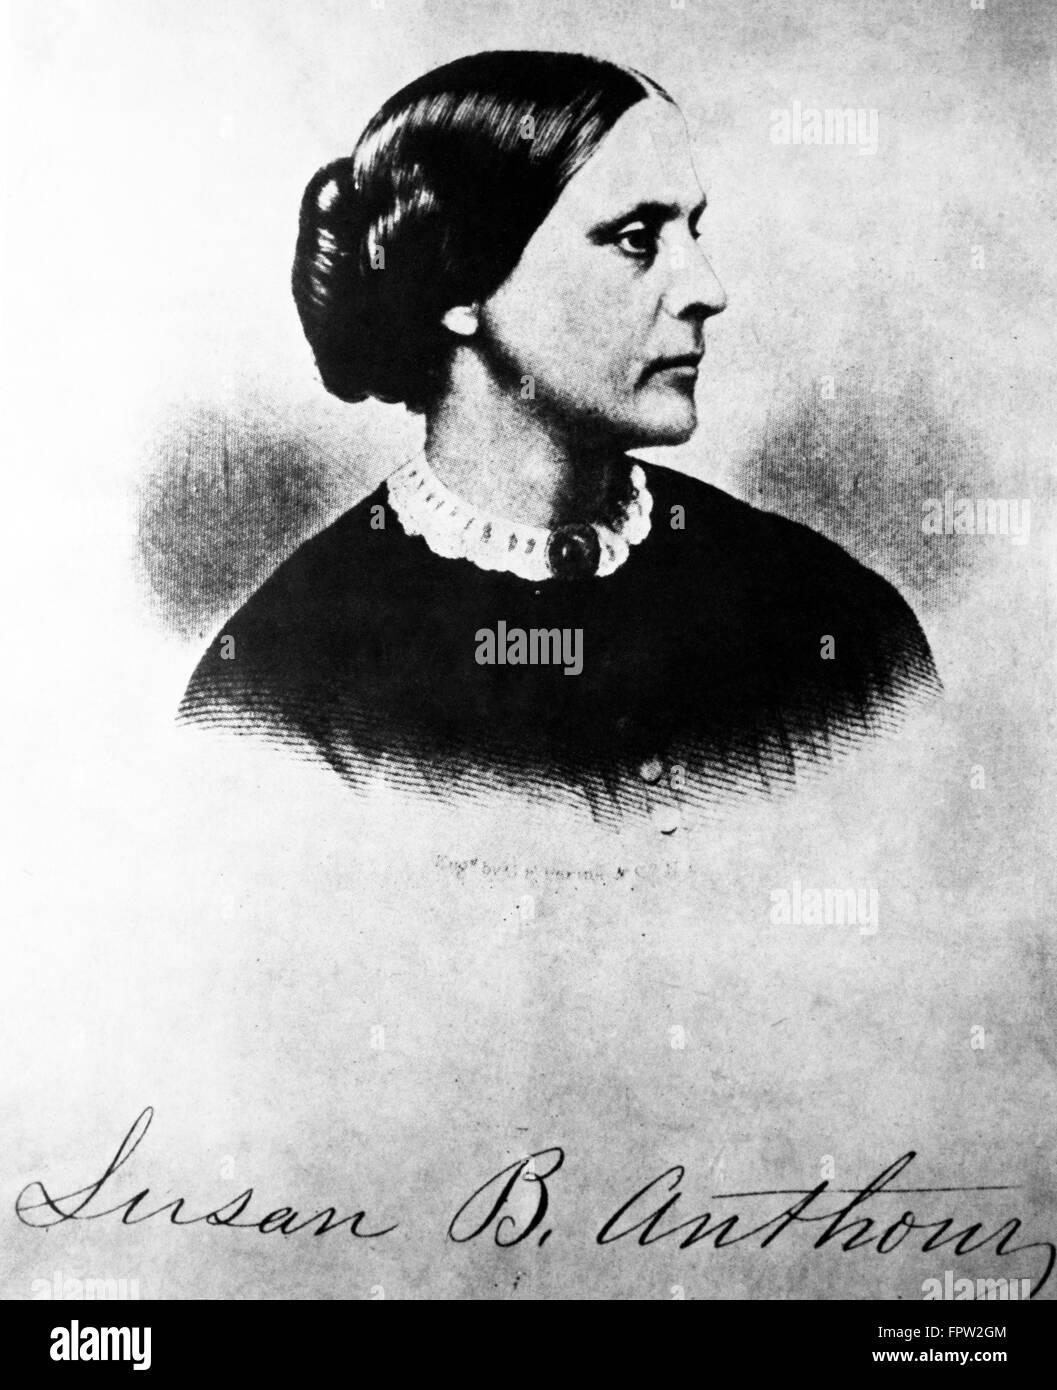 ILLUSTRATION PORTRAIT PROFILE OF SUSAN B. ANTHONY WITH SIGNATURE - Stock Image